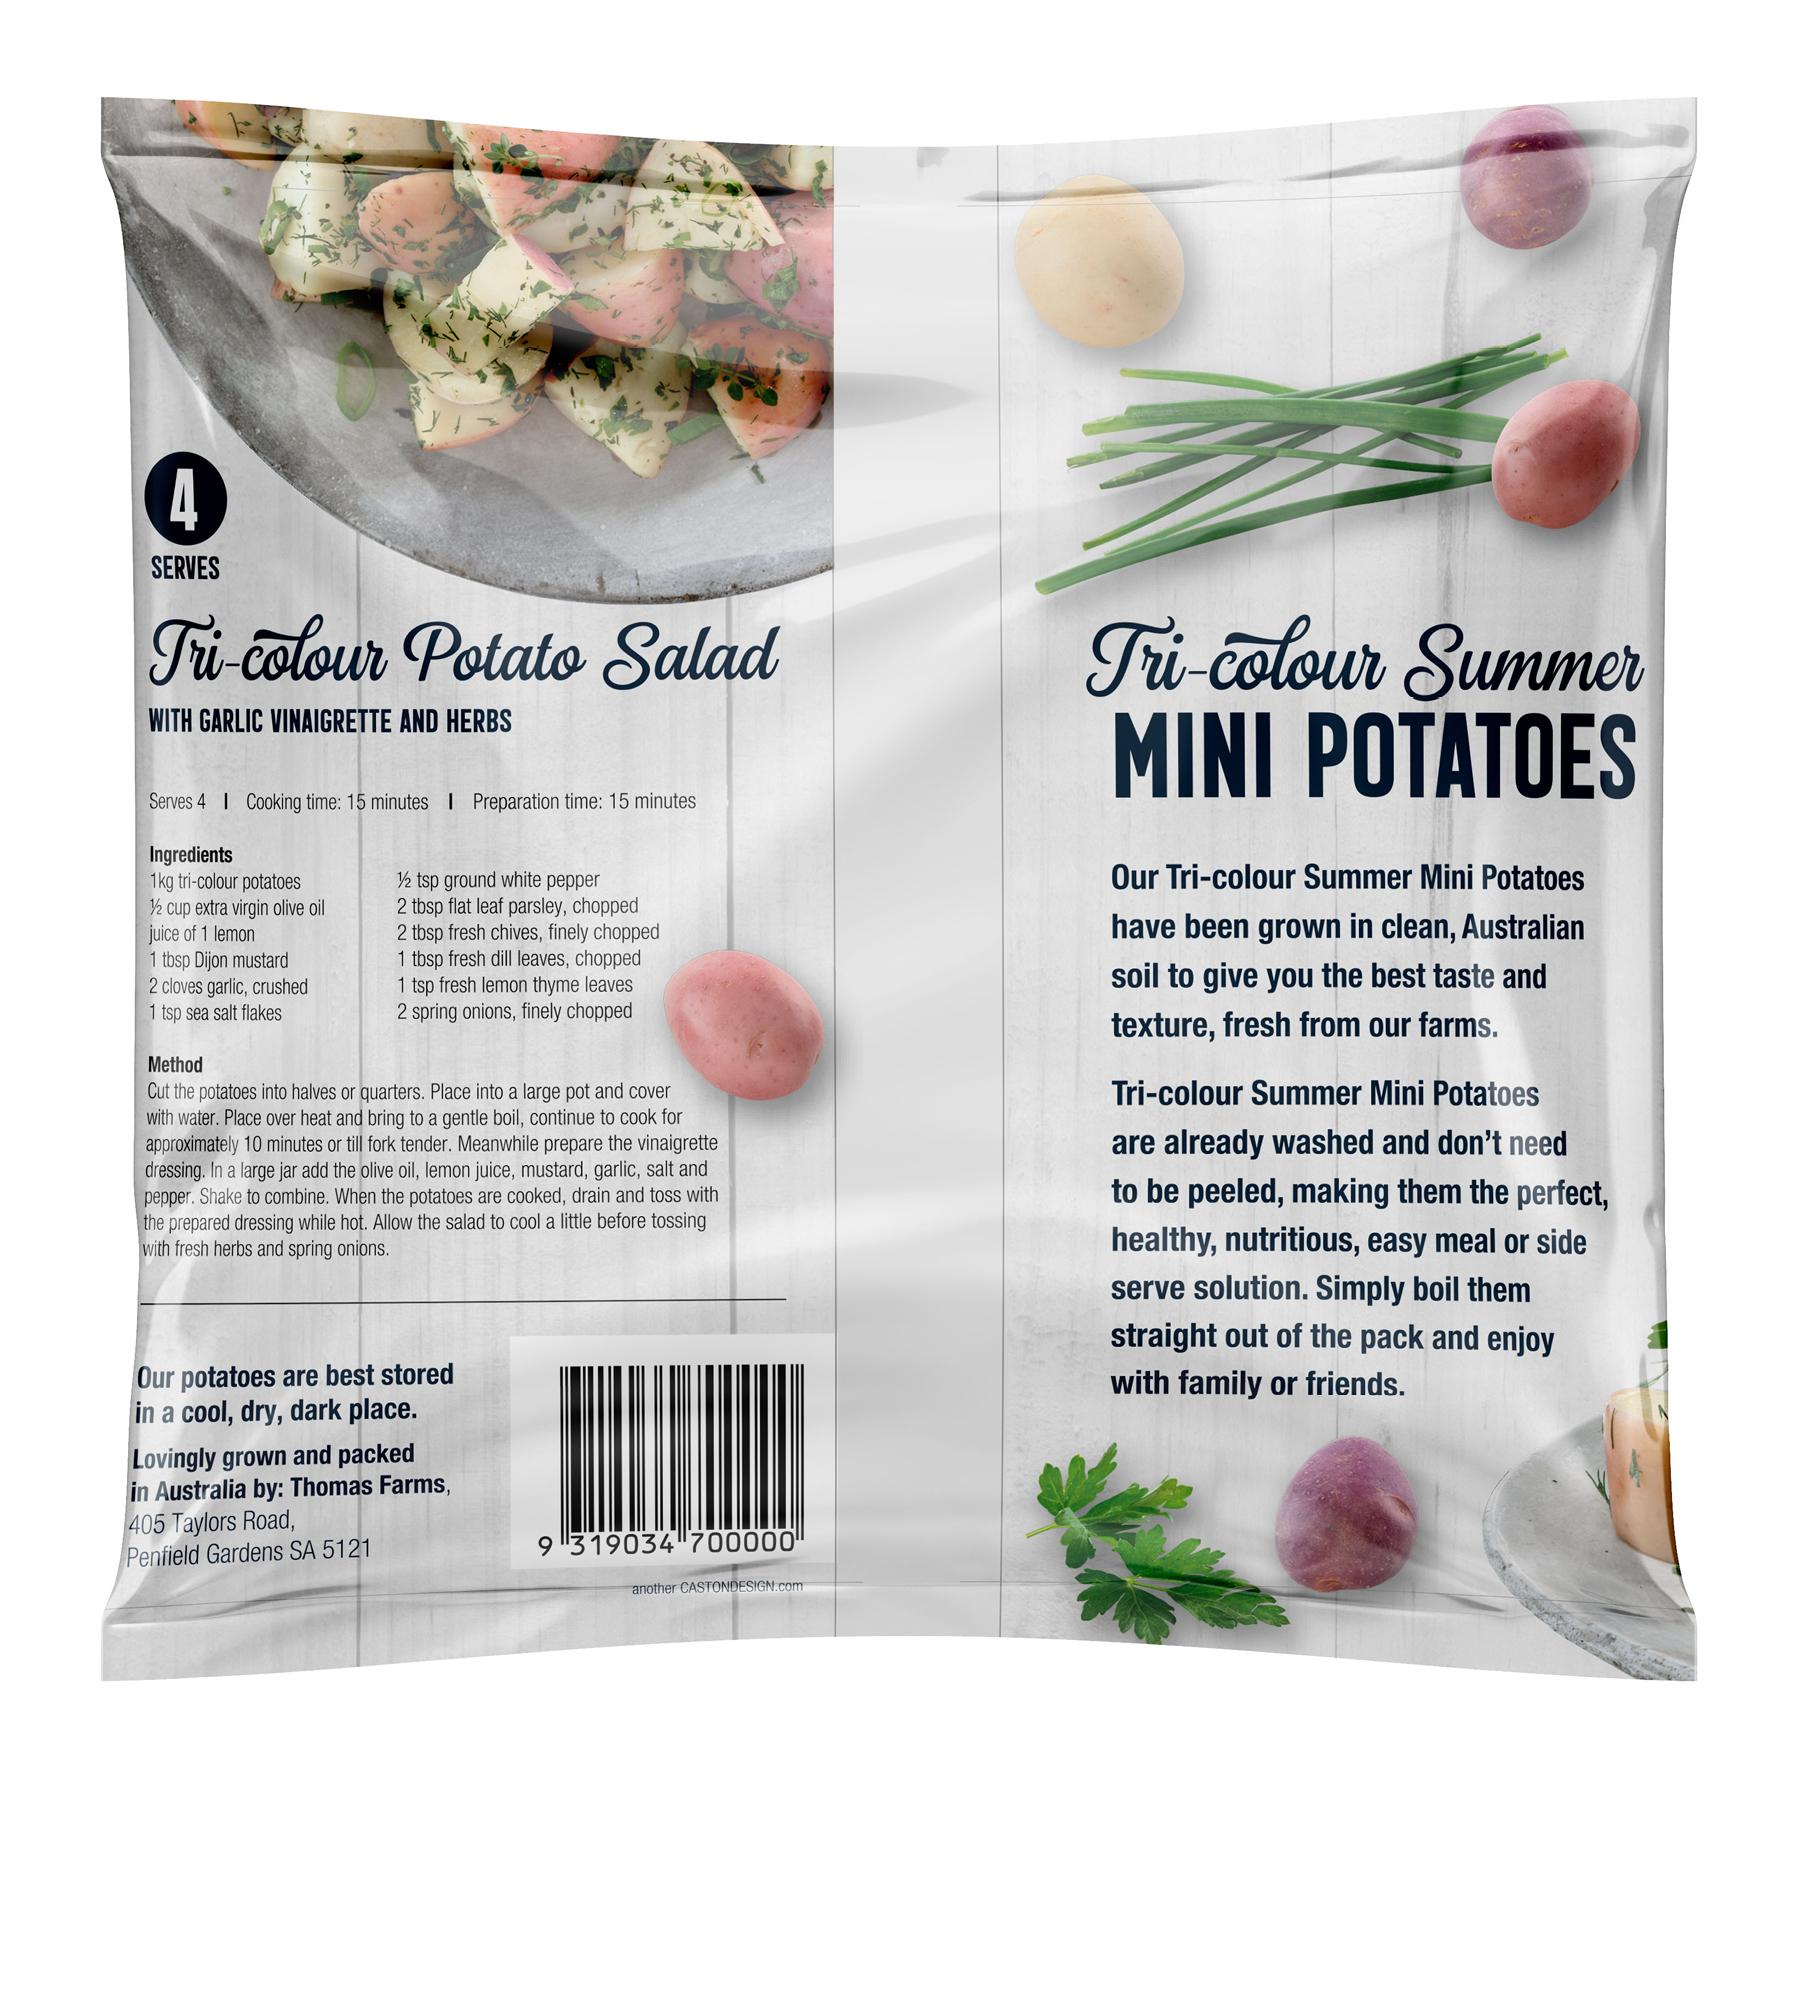 Tri-colour Summer Mini Potatoes